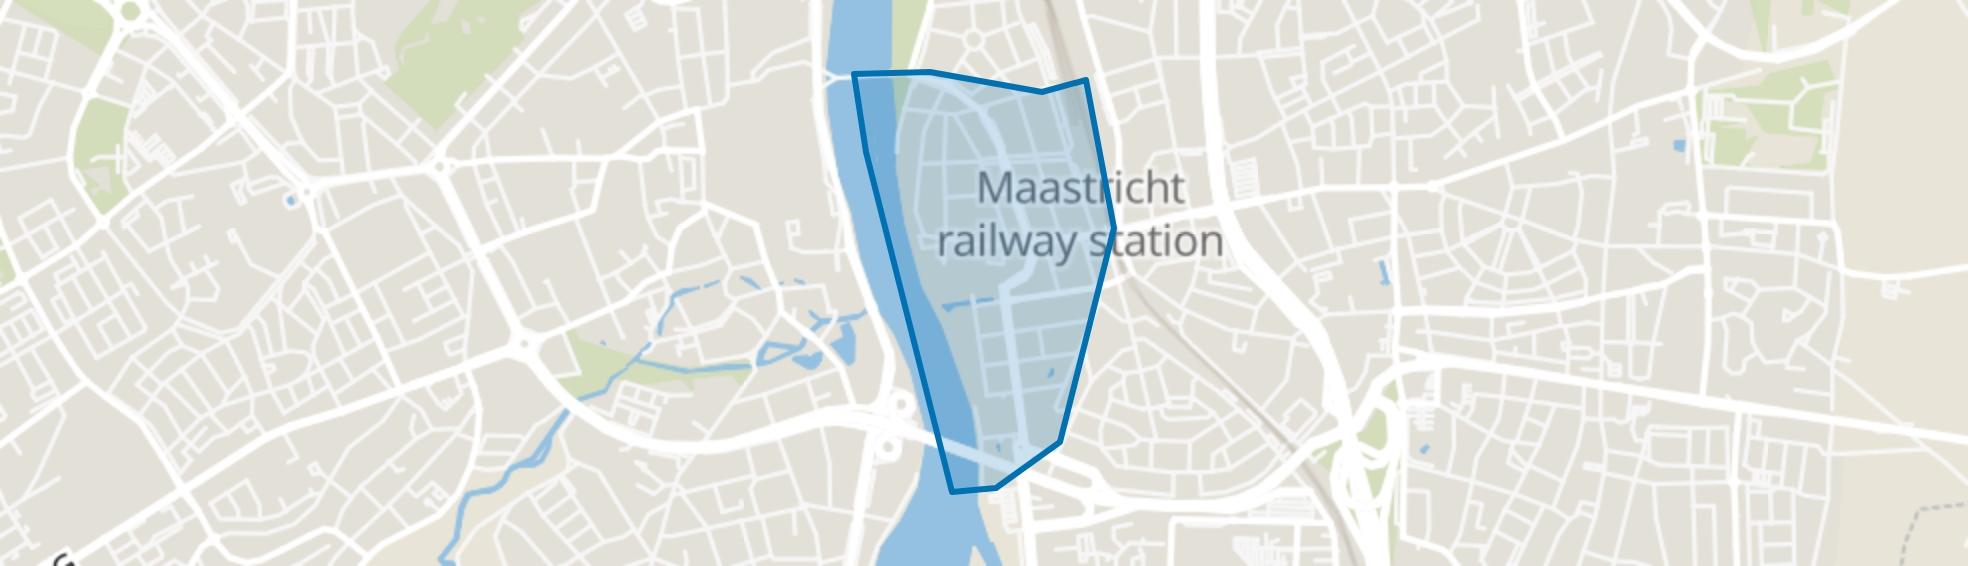 Wyck, Maastricht map